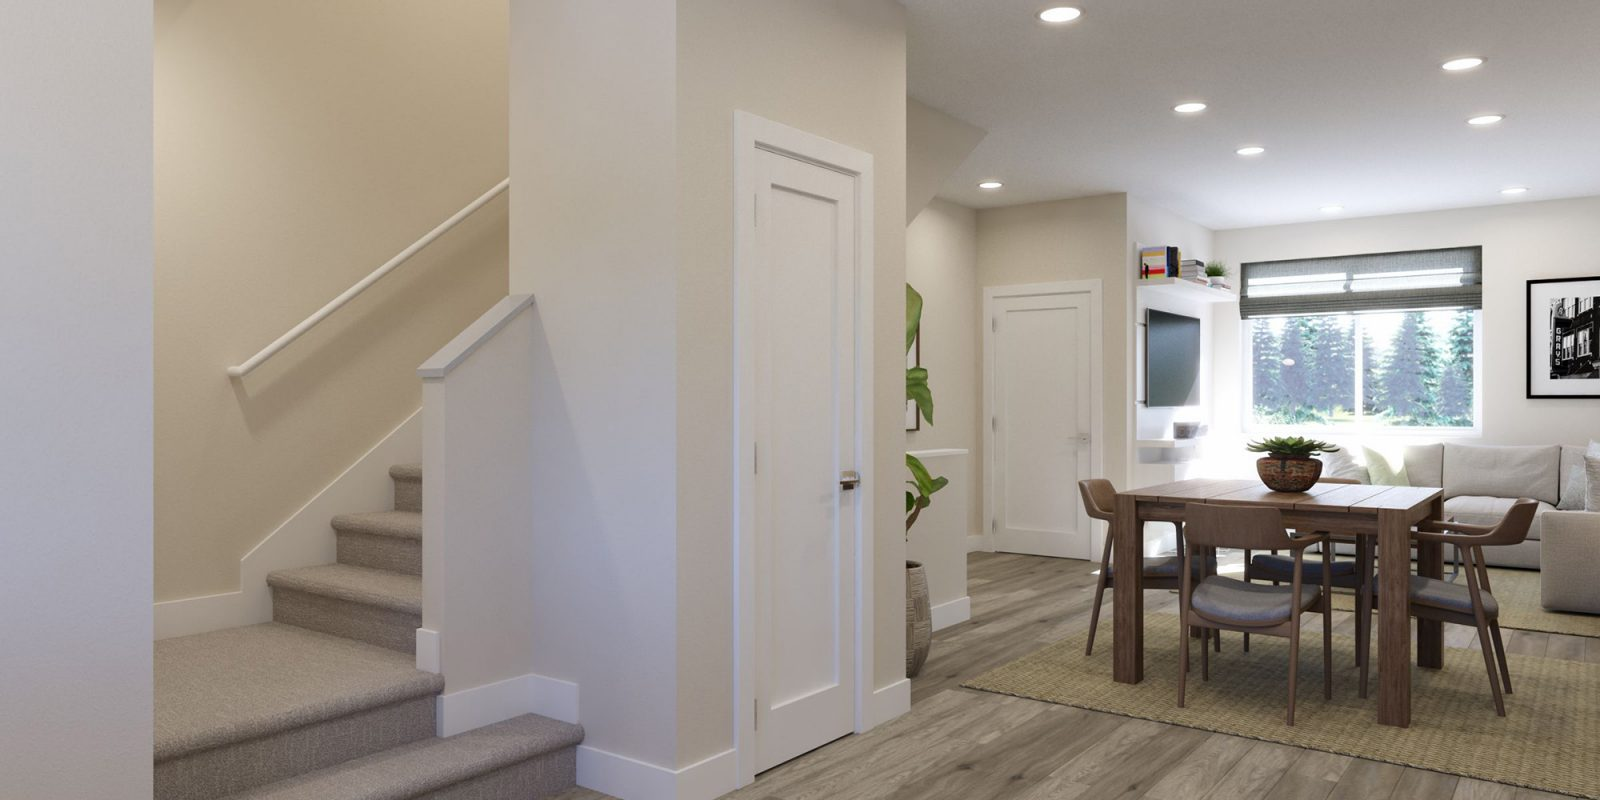 Baseline DoMore Rows: Escape - Main Living Level